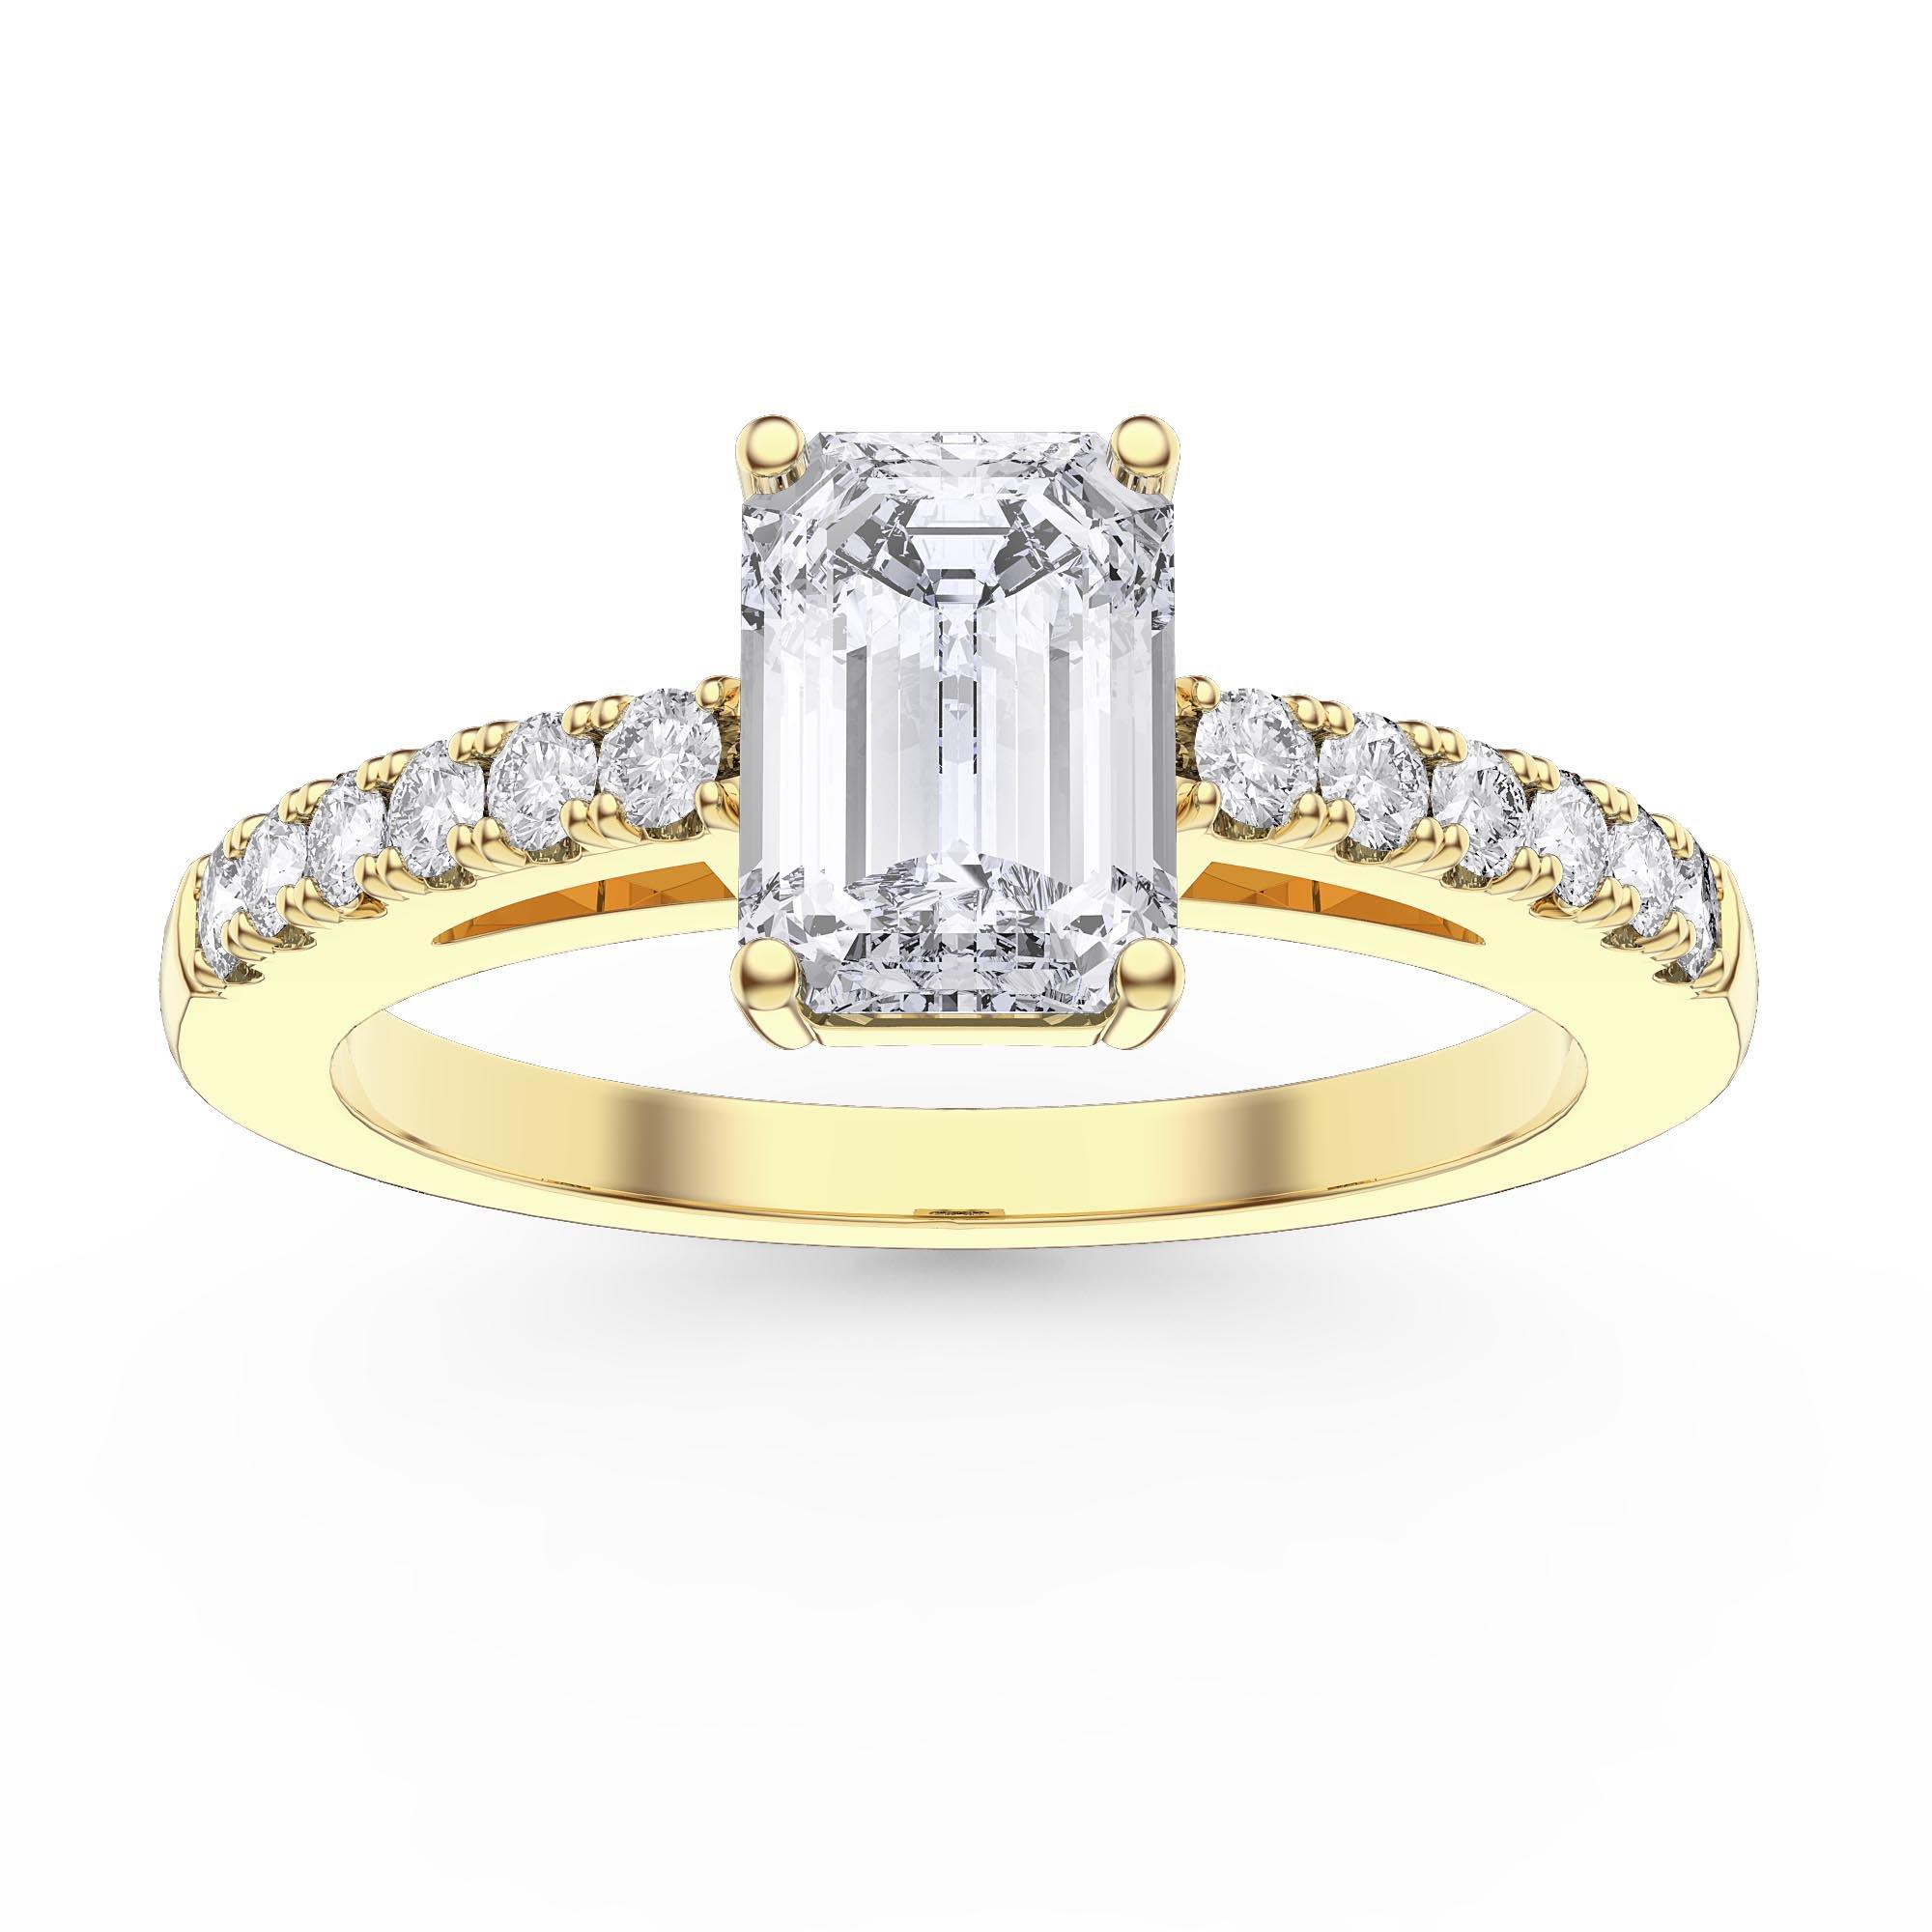 Unity 1ct Diamond Emerald Cut Pave 18k Yellow Gold Engagement Ring Jian London 18k Gold Rings